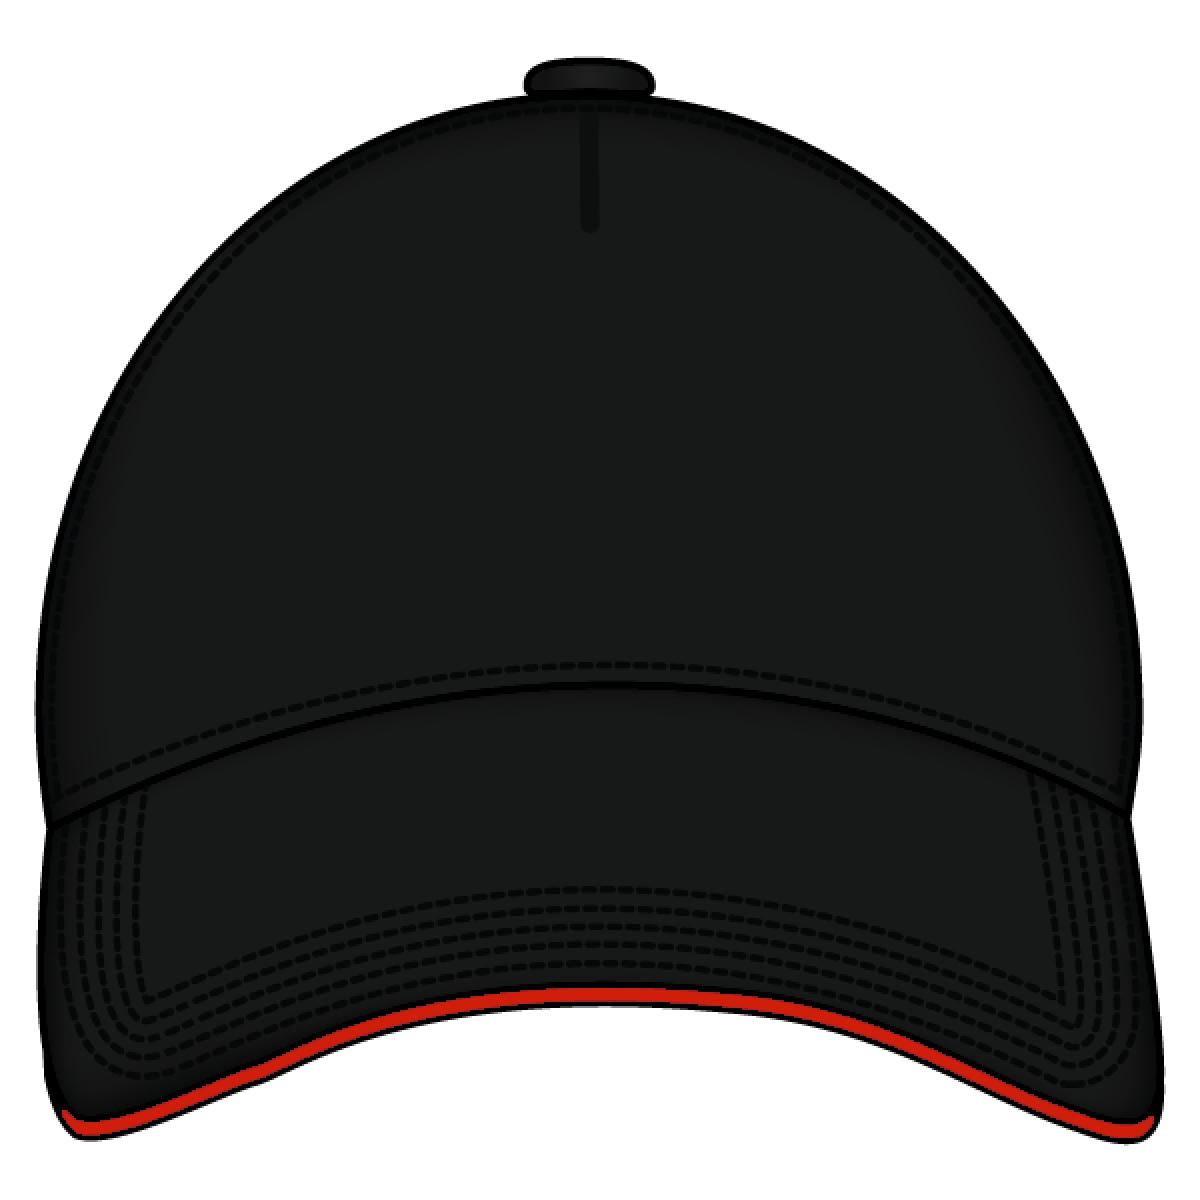 c75da78cfa0661 ... Baseball Cap Line Art - Free Clip Art. Cap Black Front - Caps PNG Black  And White